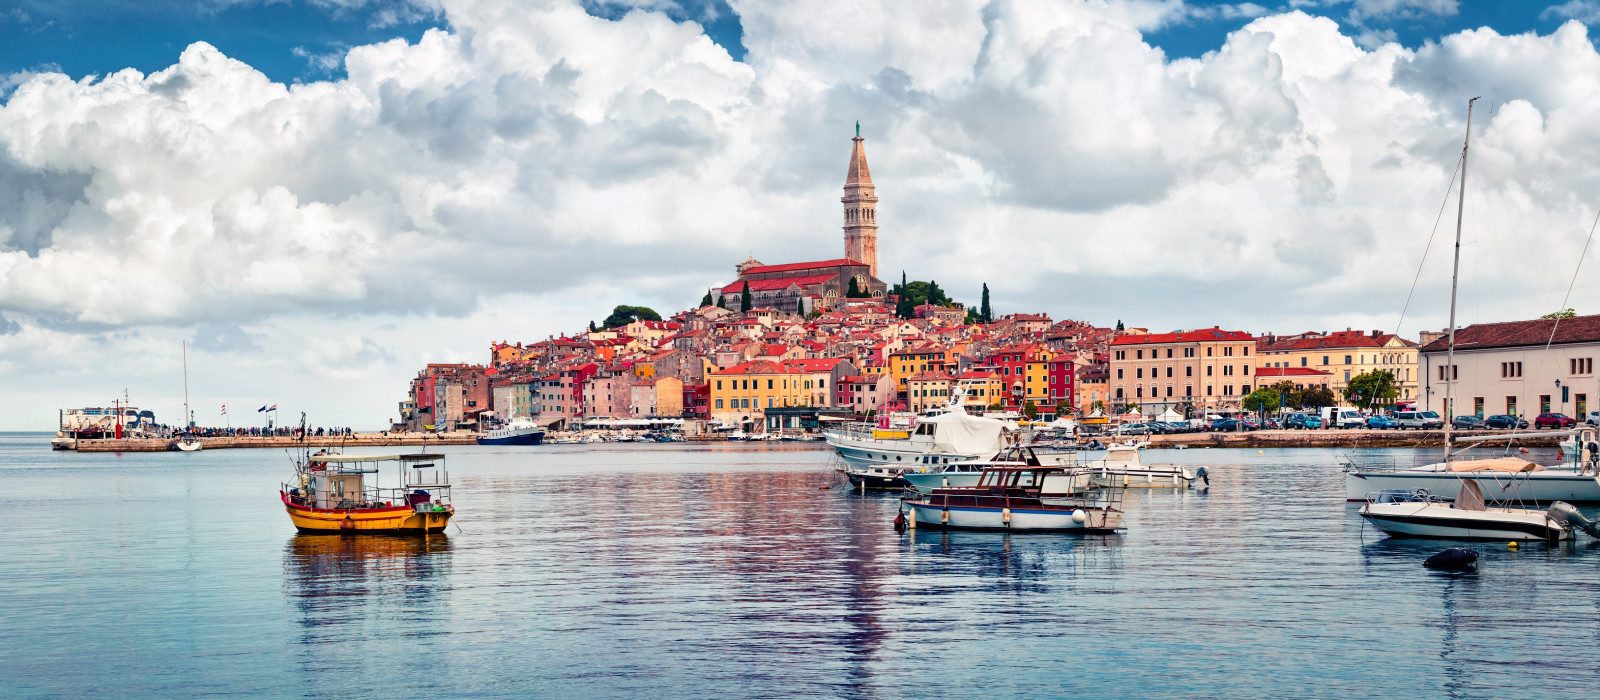 Destination Rovinj Croatia & Slovenia